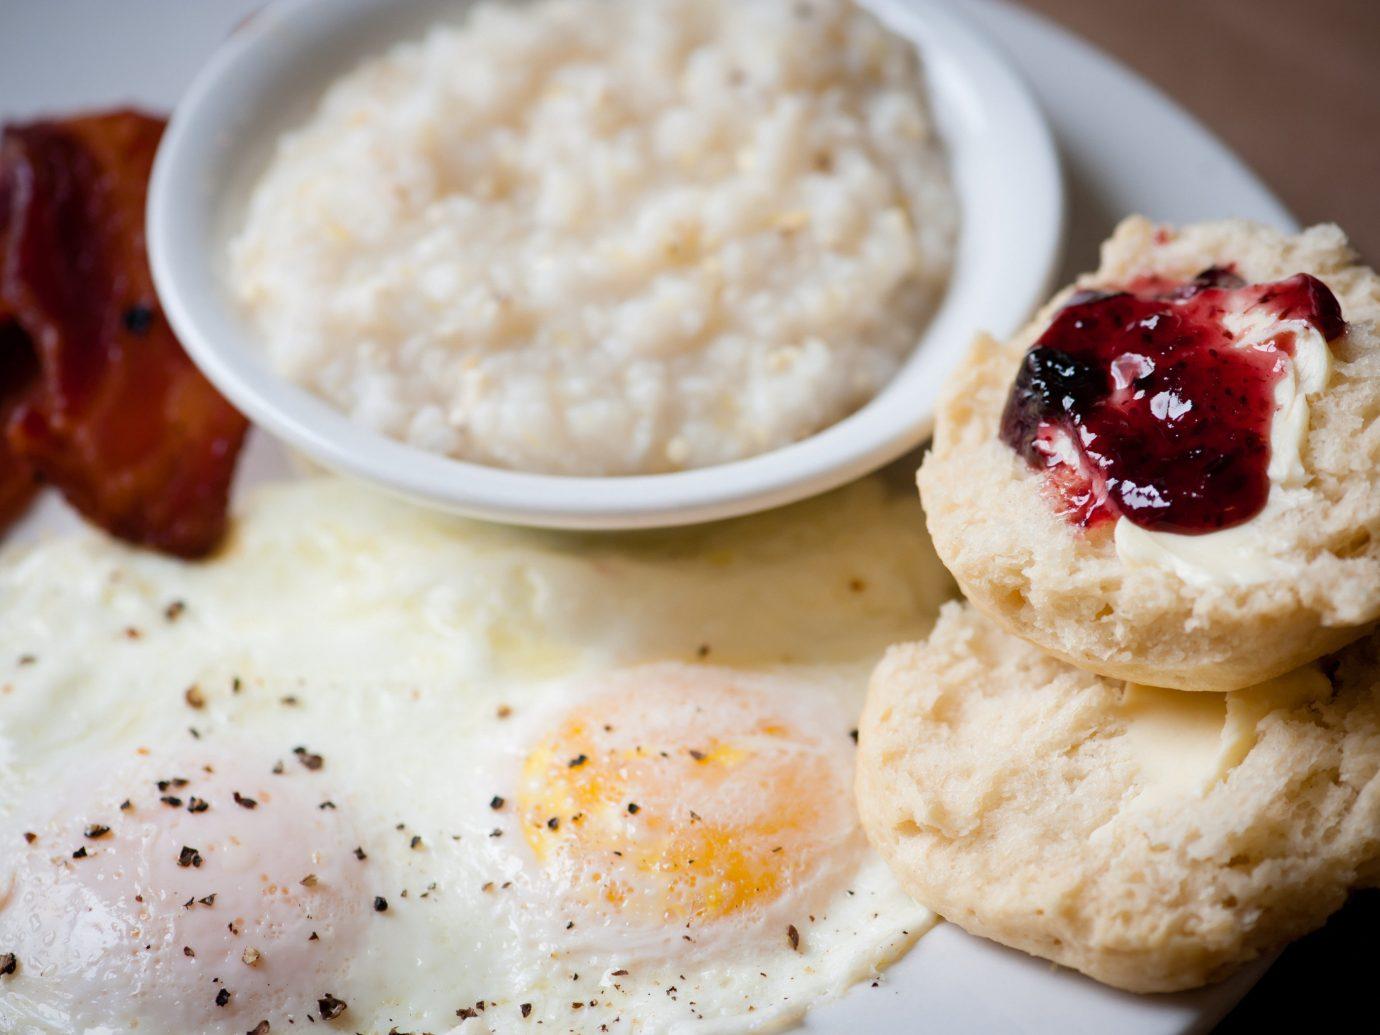 Food + Drink Trip Ideas food dish plate meal breakfast produce cuisine cream